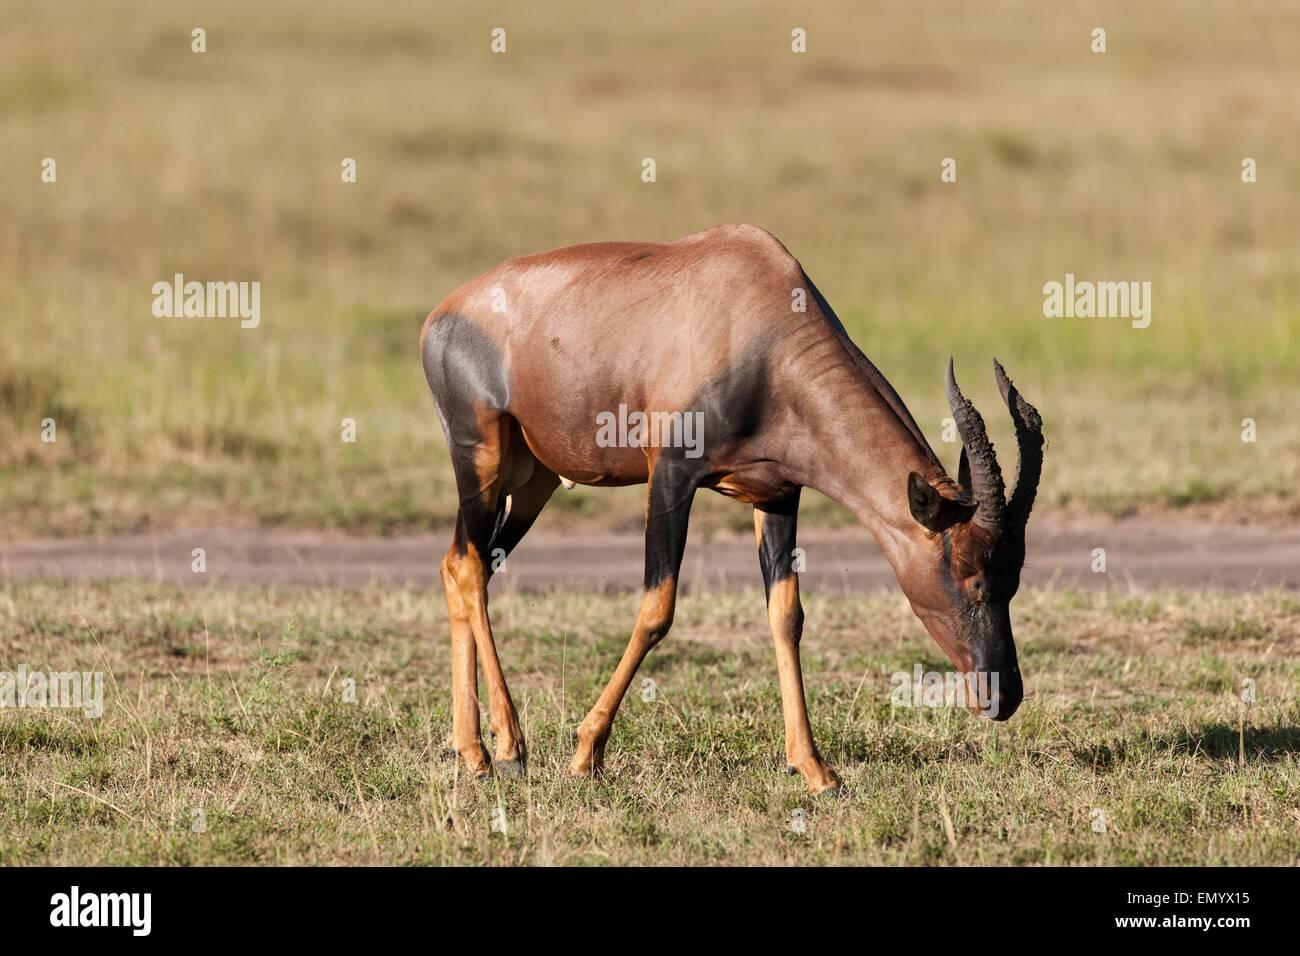 topi antelope in the savanna of Kenya - Stock Image